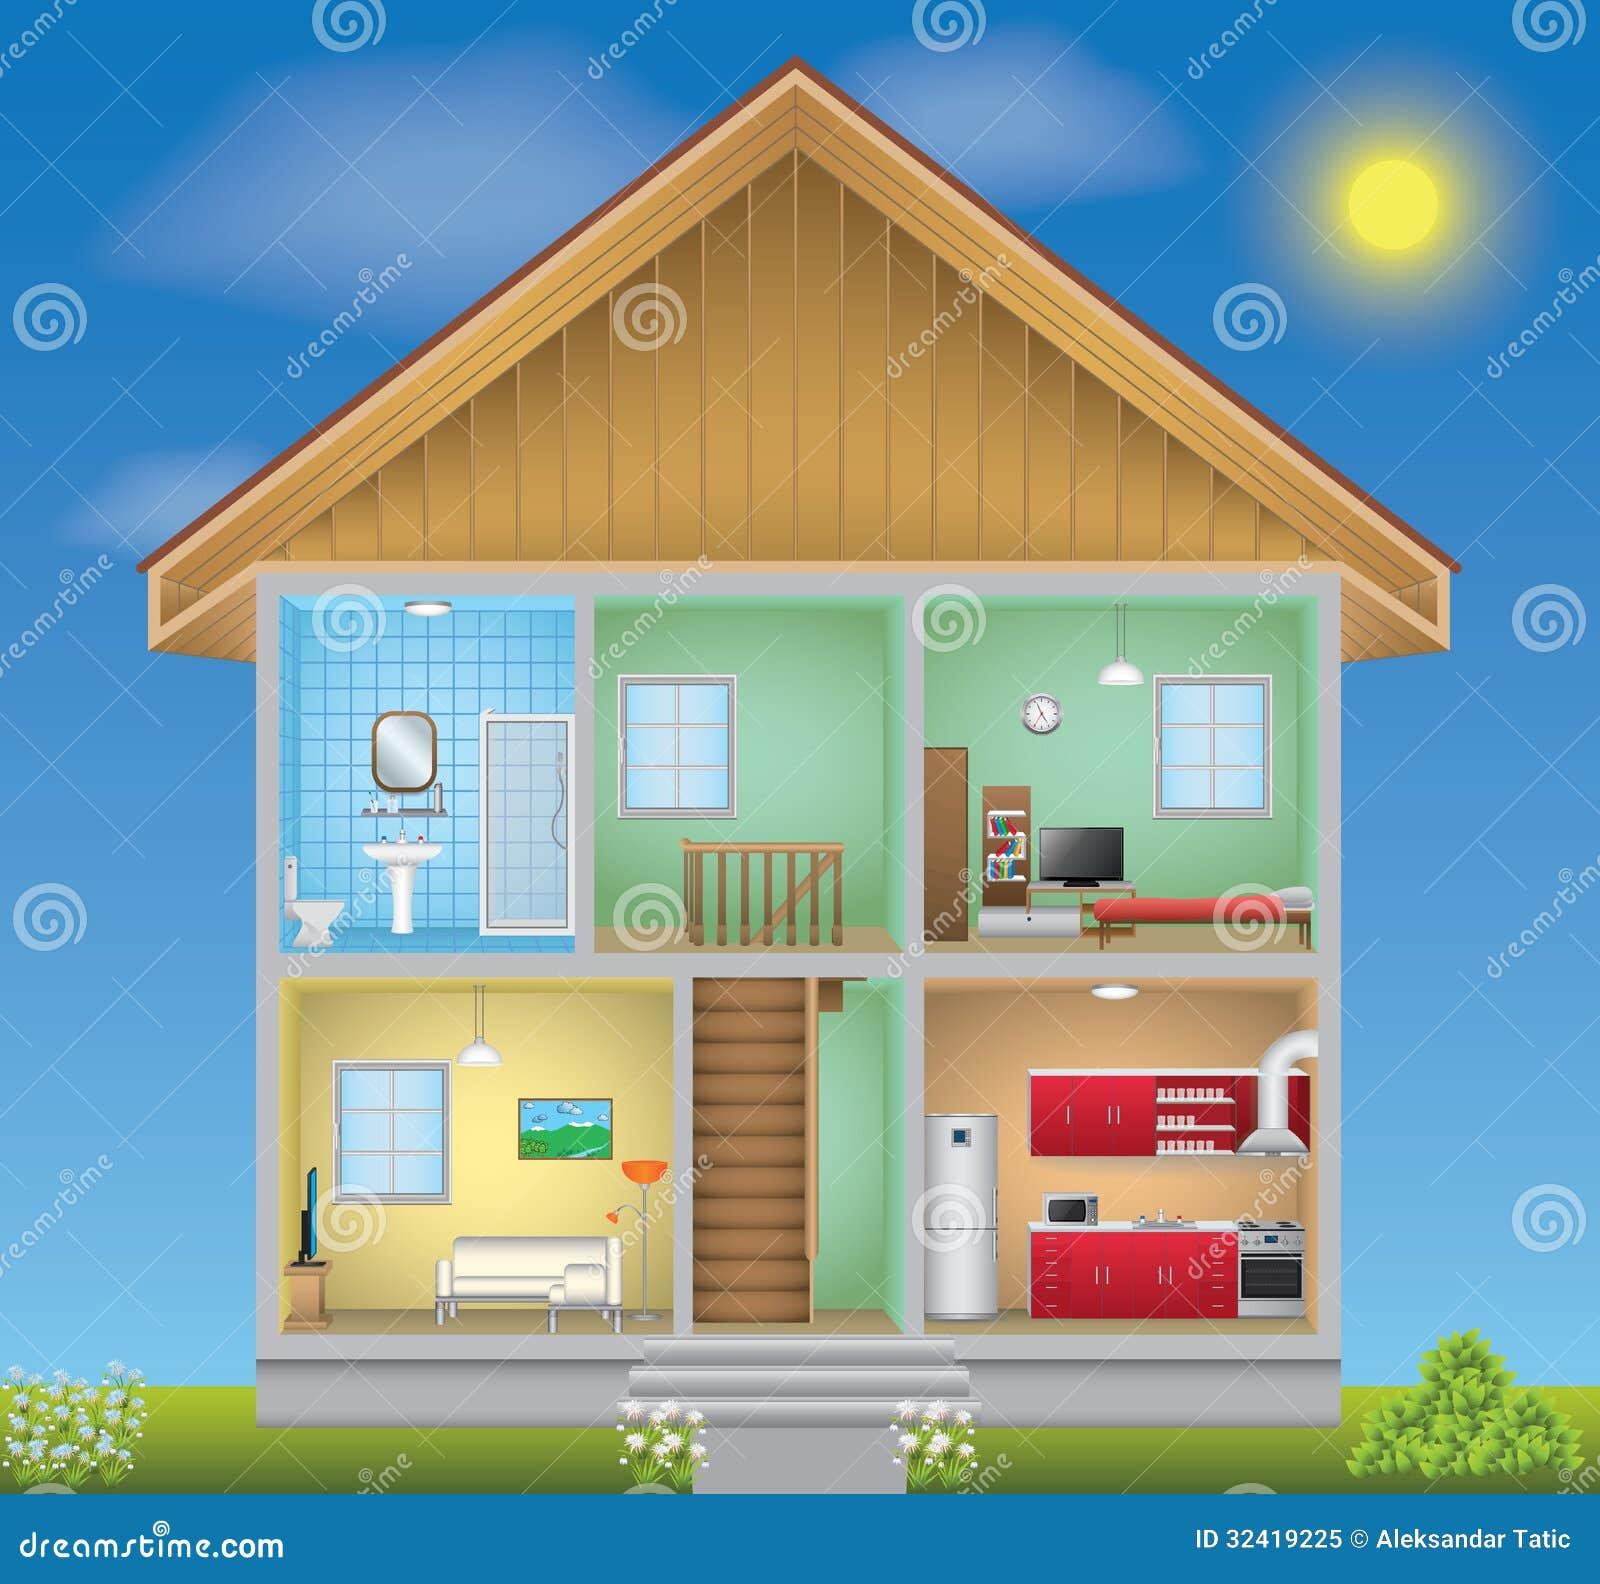 Detailed house interior stock illustration image of comfort 32419225 - Inside home image ...